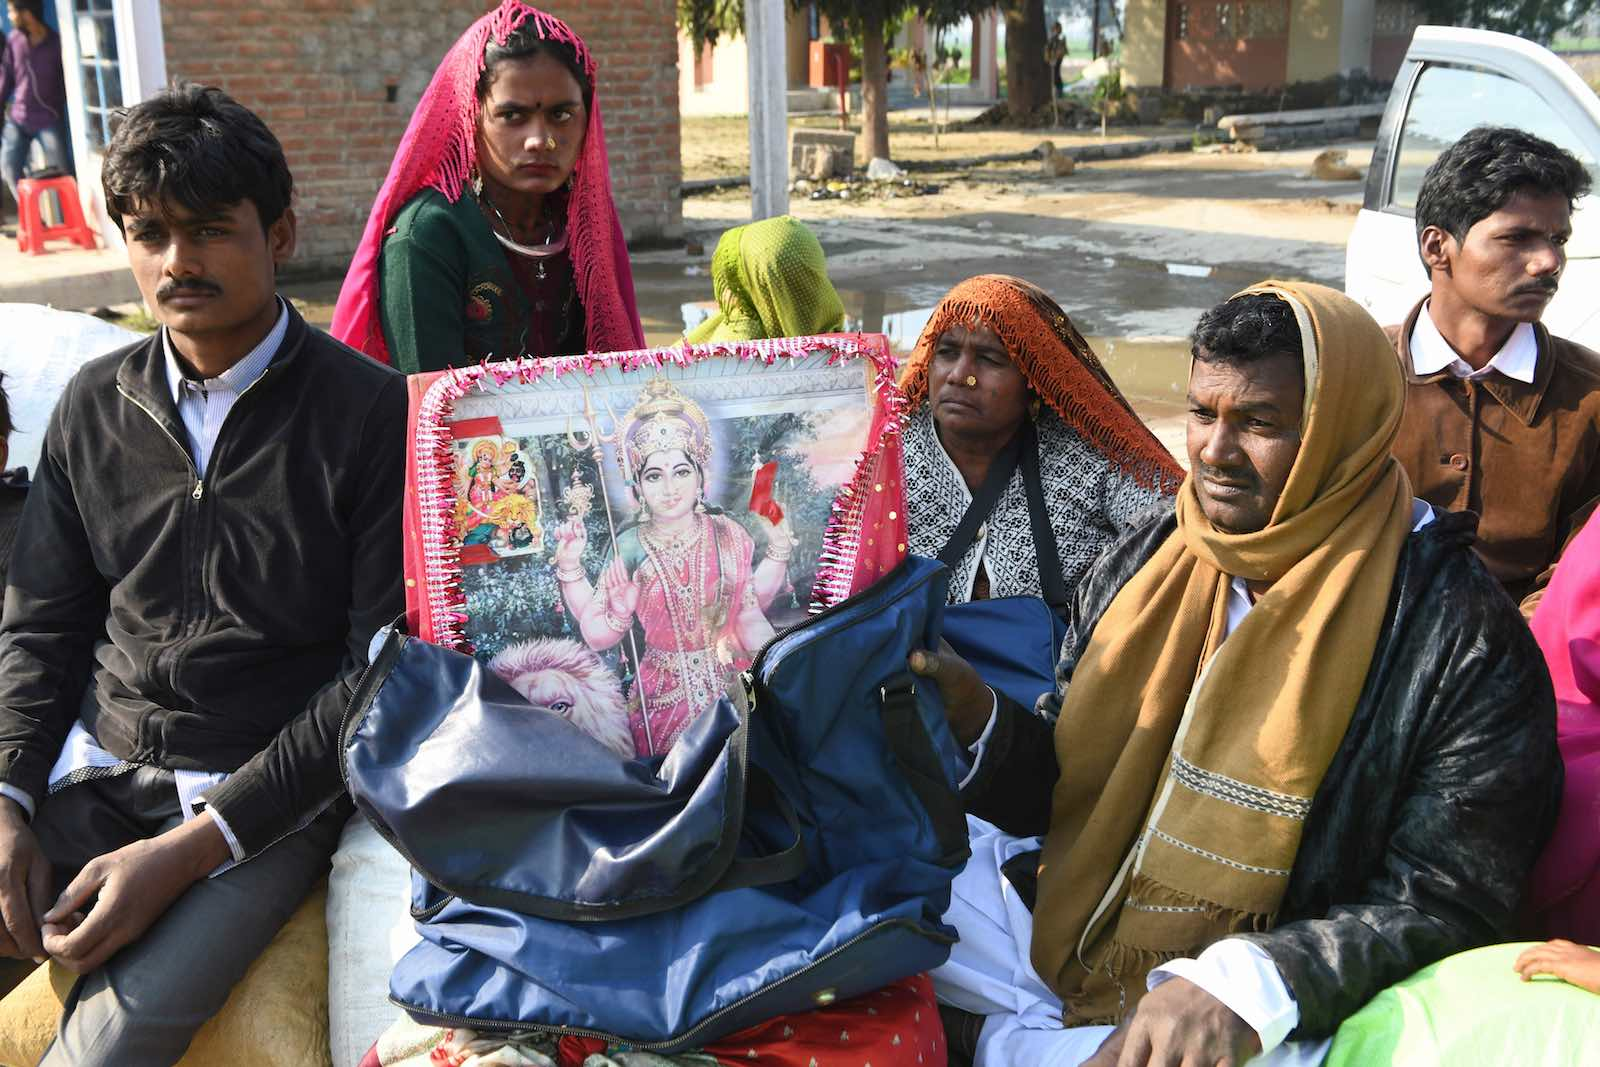 Pakistani Hindu pilgrims wait at the India-Pakistan Wagah border post, near Amritsaron 3 February. (Narinder Nanu/AFP/Getty Images)